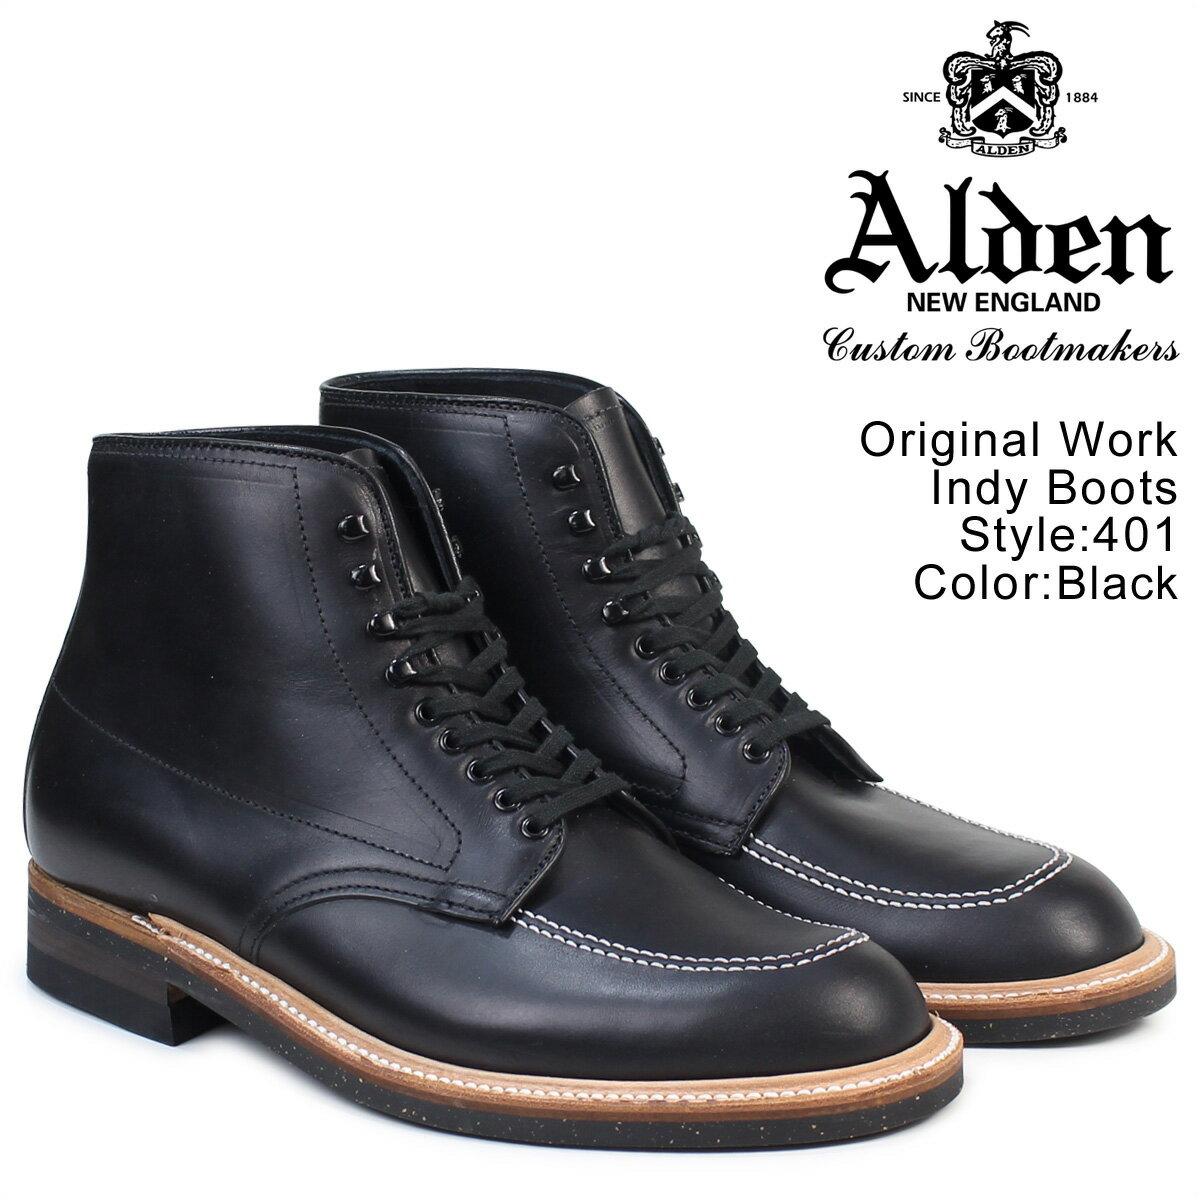 ALDEN オールデン インディー ブーツ ORIGINAL WORK INDY BOOTS Dワイズ 401 メンズ あす楽 [11/26 追加入荷]